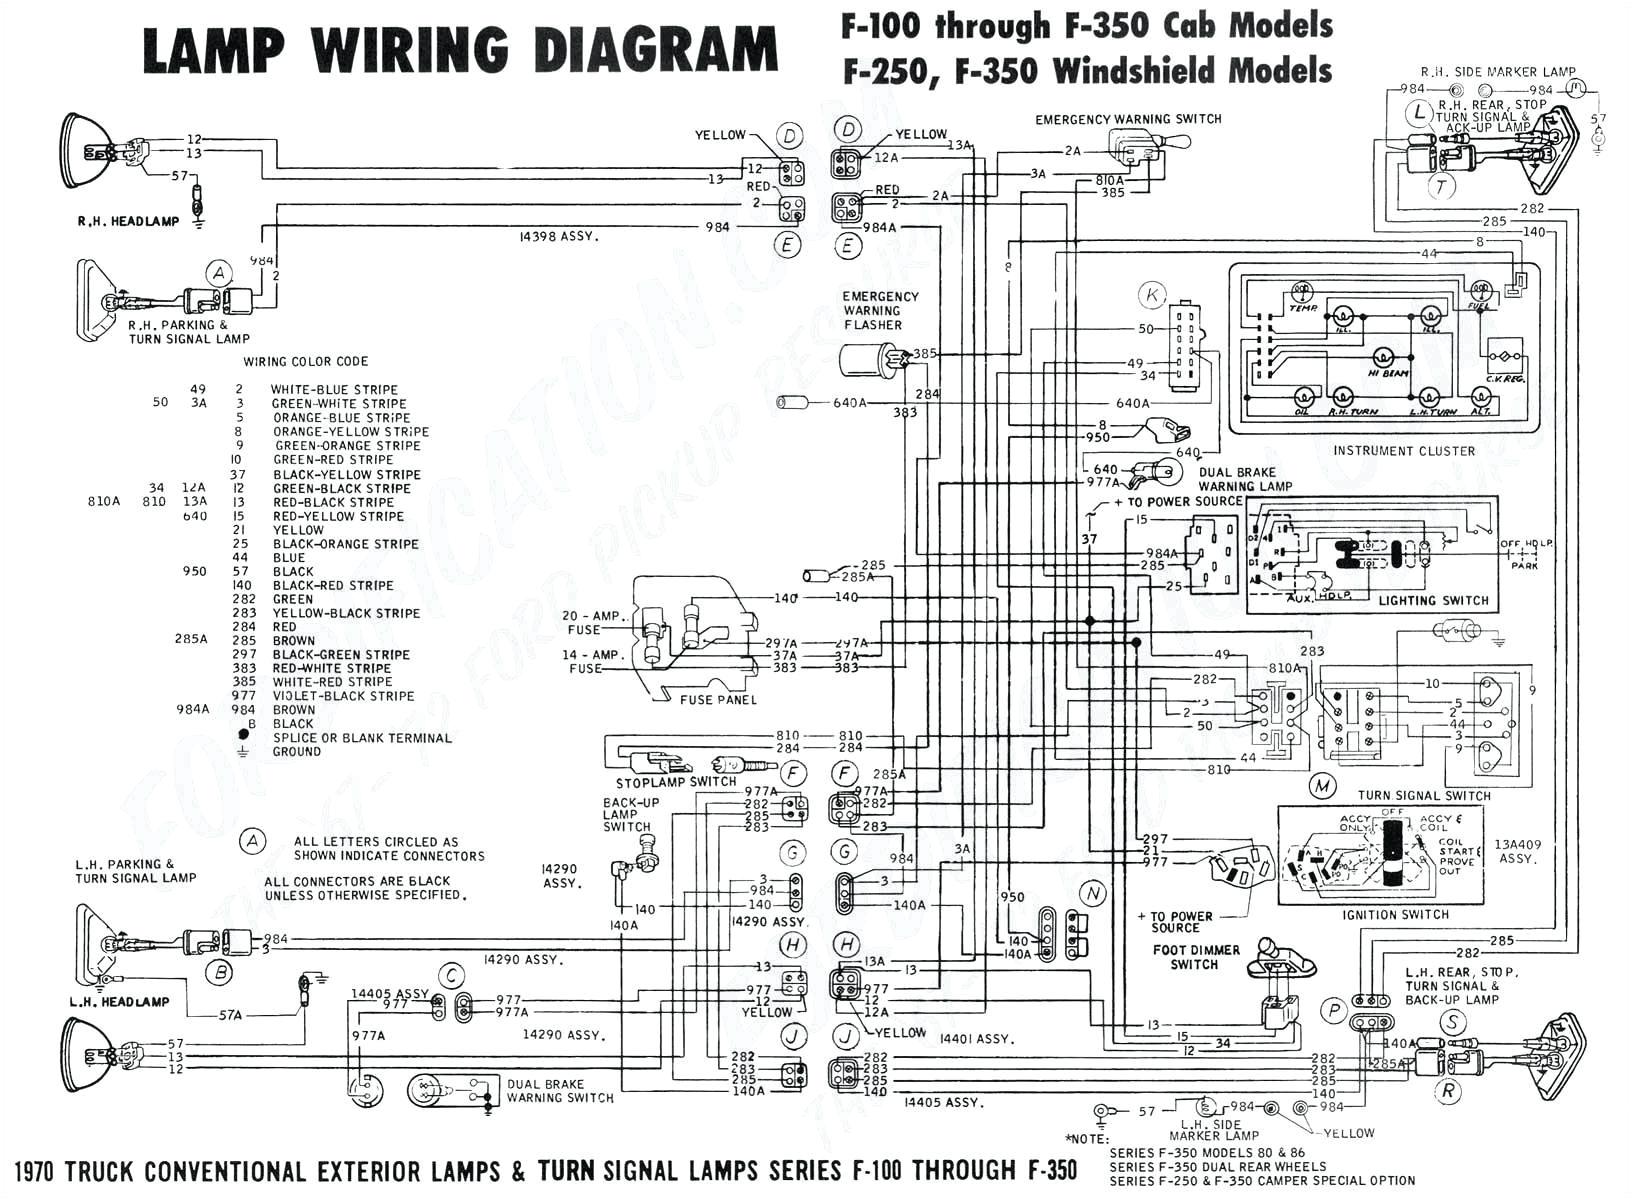 sr20det wiring diagram wiring diagram s15 wiring diagram wiring diagram posts15 wiring diagram wiring diagram technic